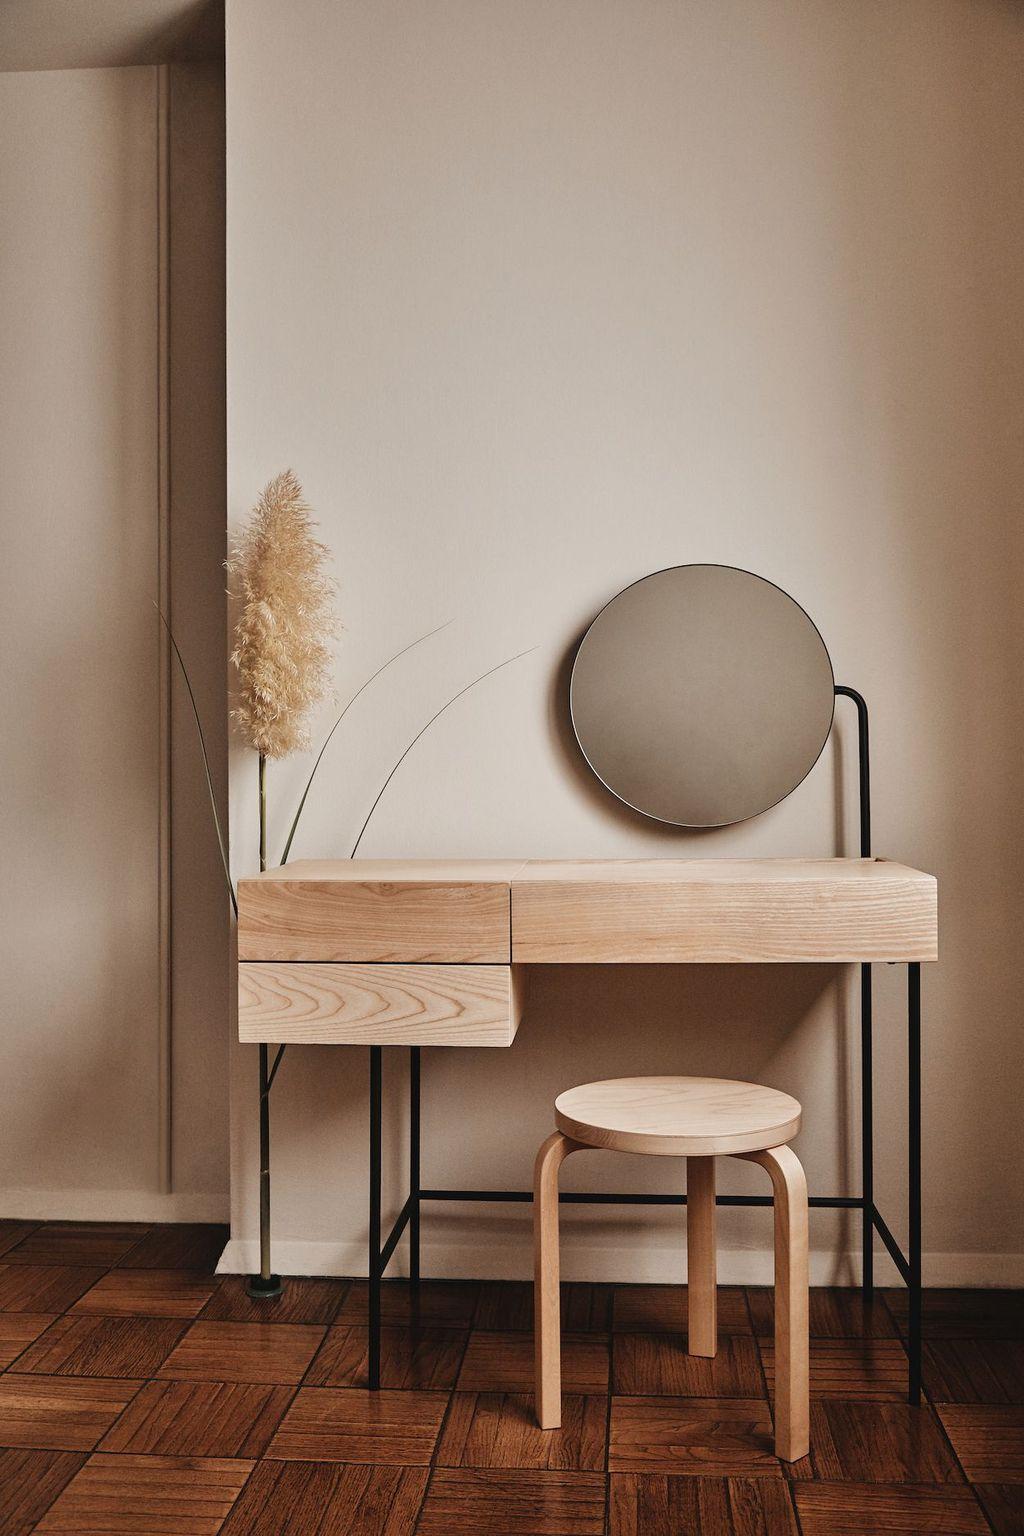 Admirable Minimalist Modern Furniture Design Ideas 08